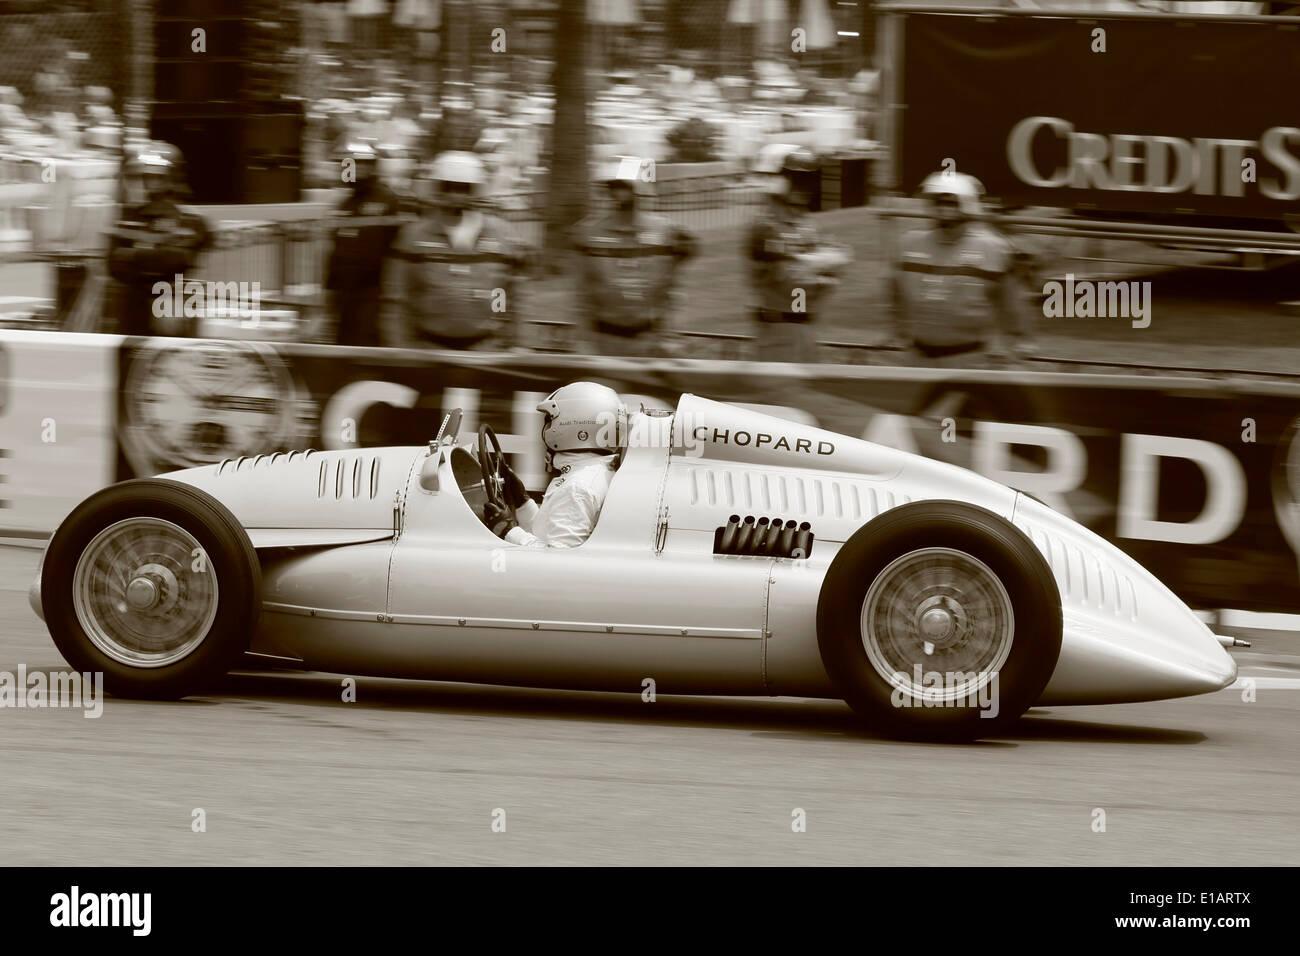 Auto Union Type C Racing Car Silver Arrow Replica 9th